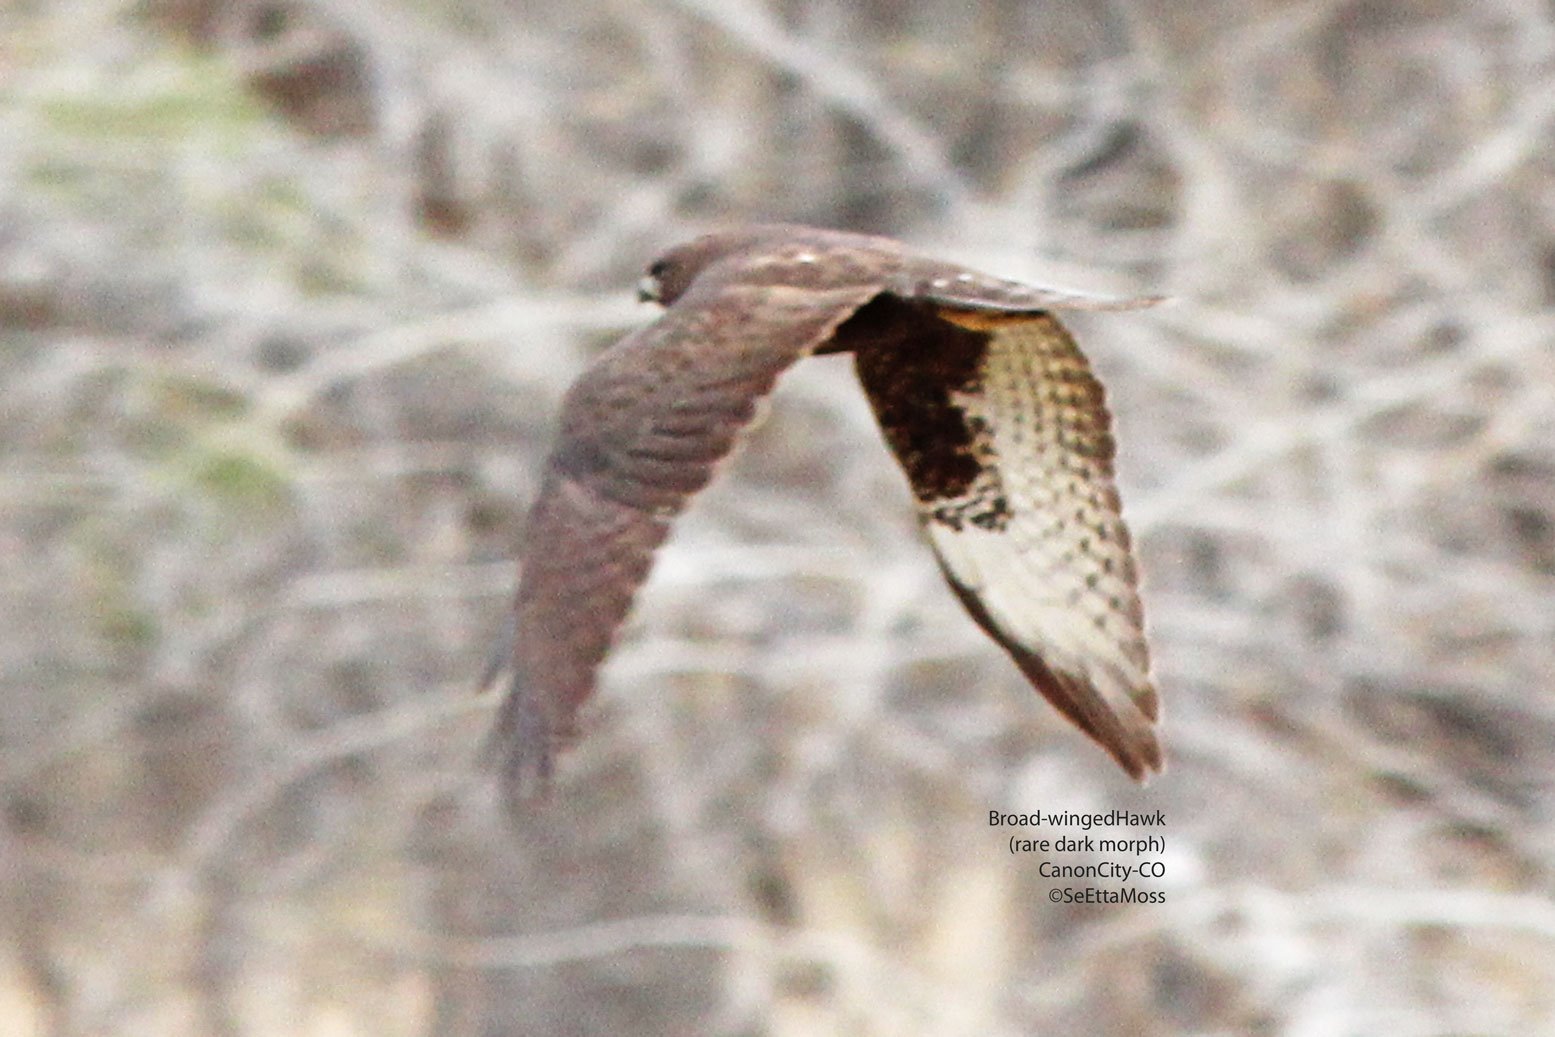 Birds and Nature: Rare dark morph Broad-winged Hawk in ...